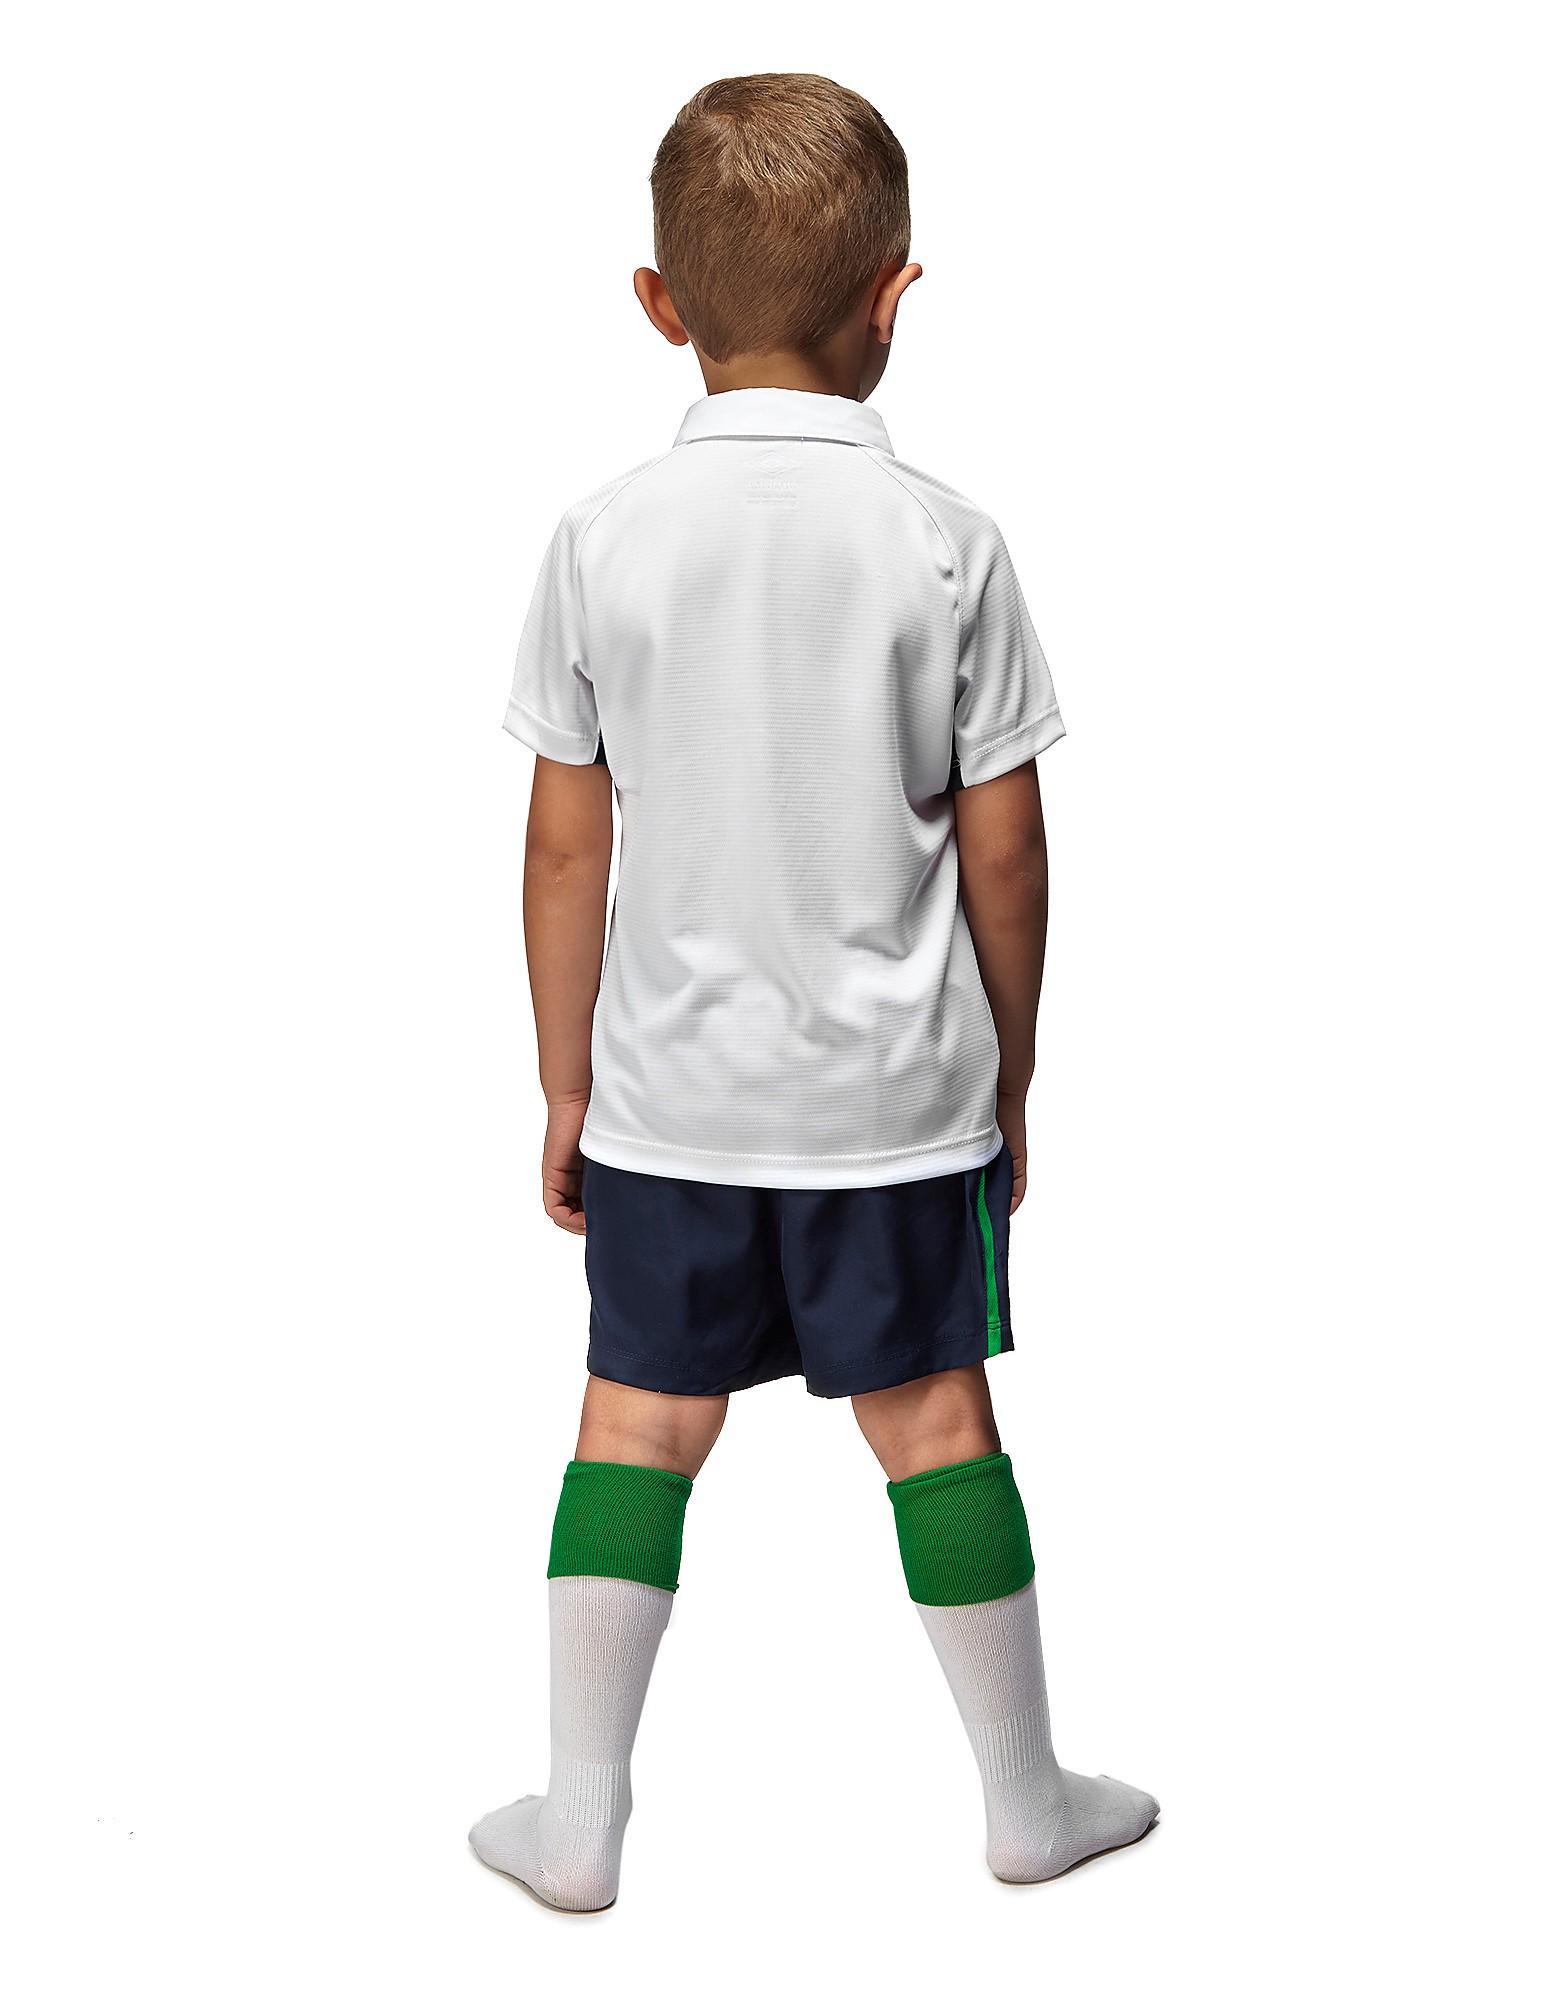 Umbro Republic of Ireland 2014 Away Kit Childrens